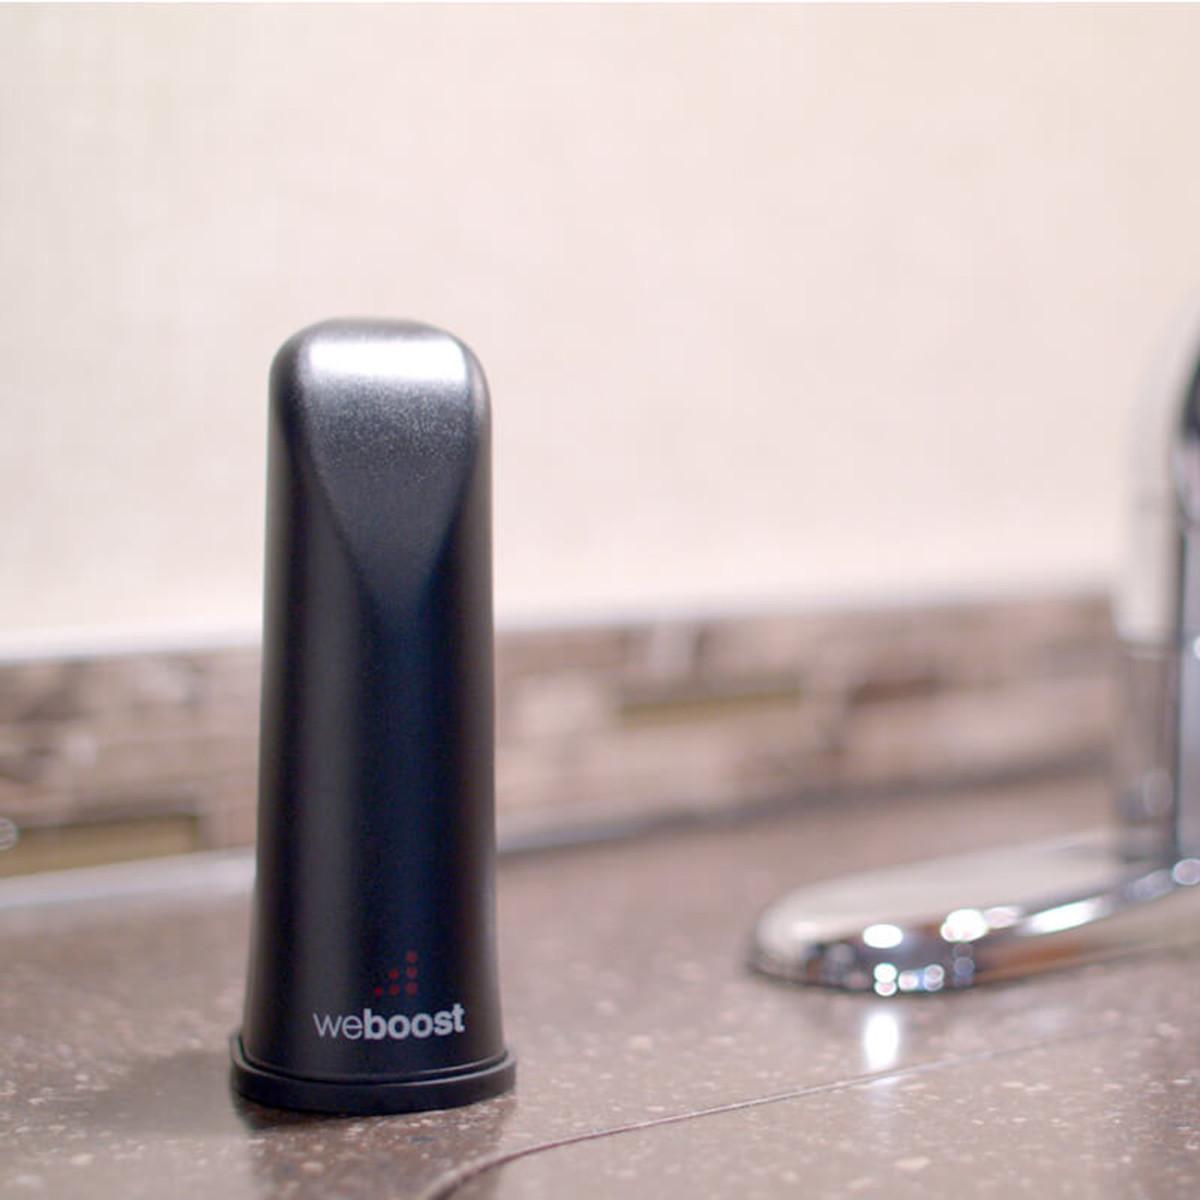 weBoost Drive 4G-X RV Cell Phone Booster Kit | Desktop Antenna